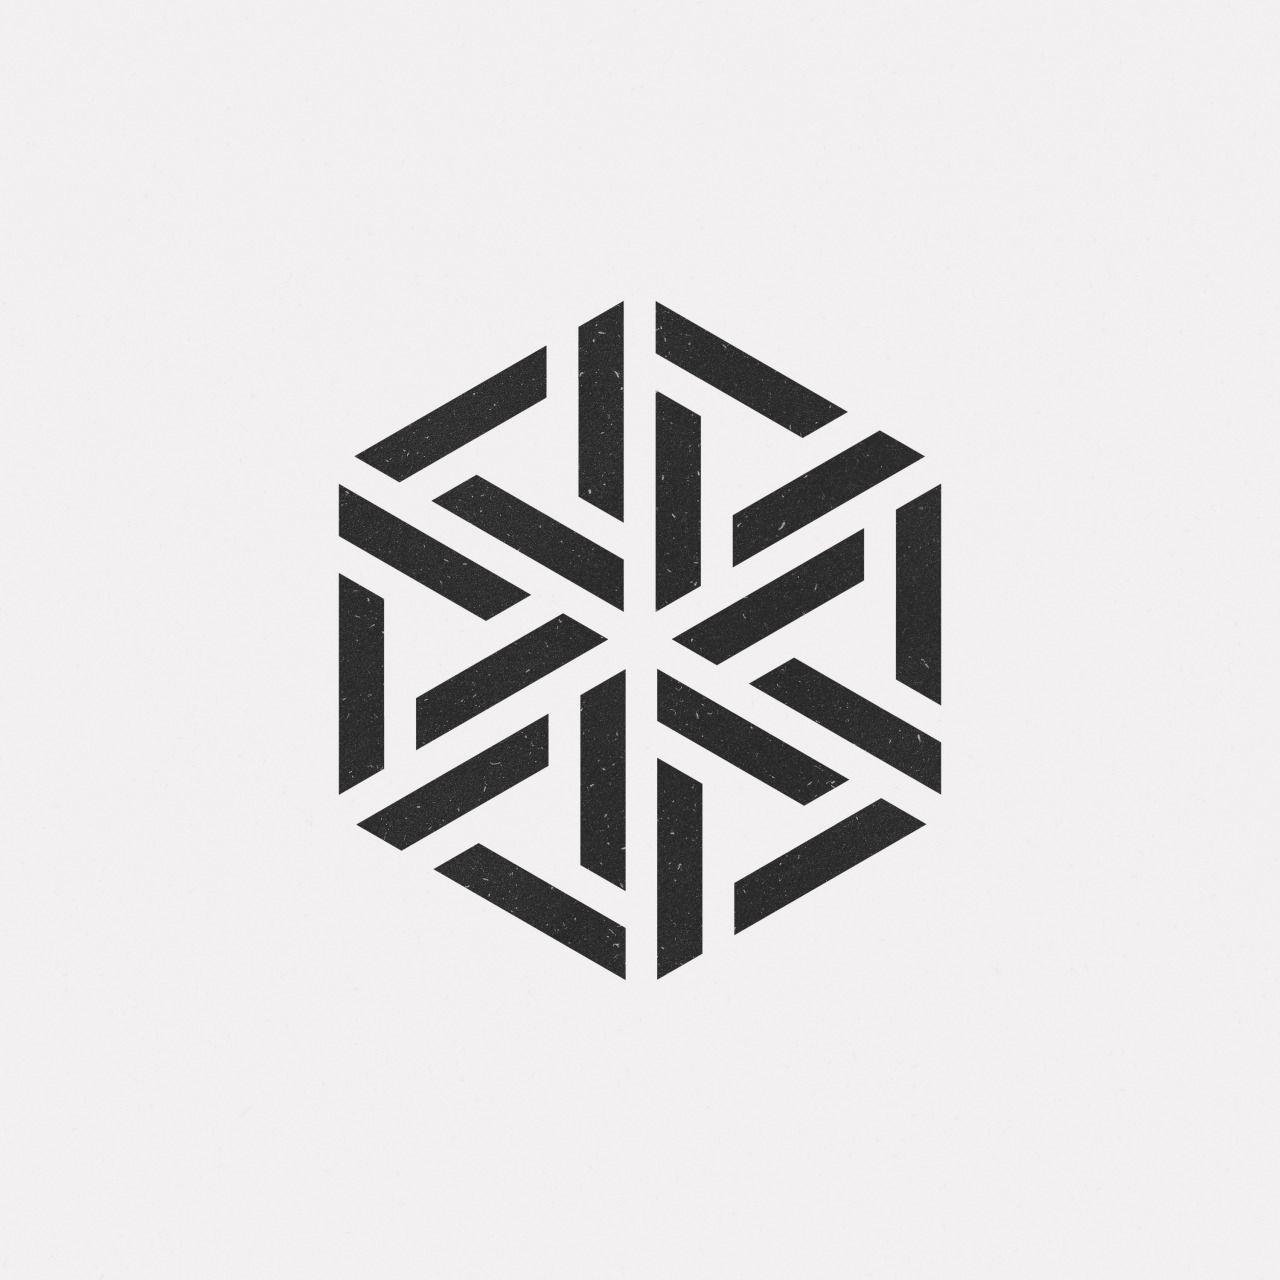 #OC16-732 A new geometric design every day